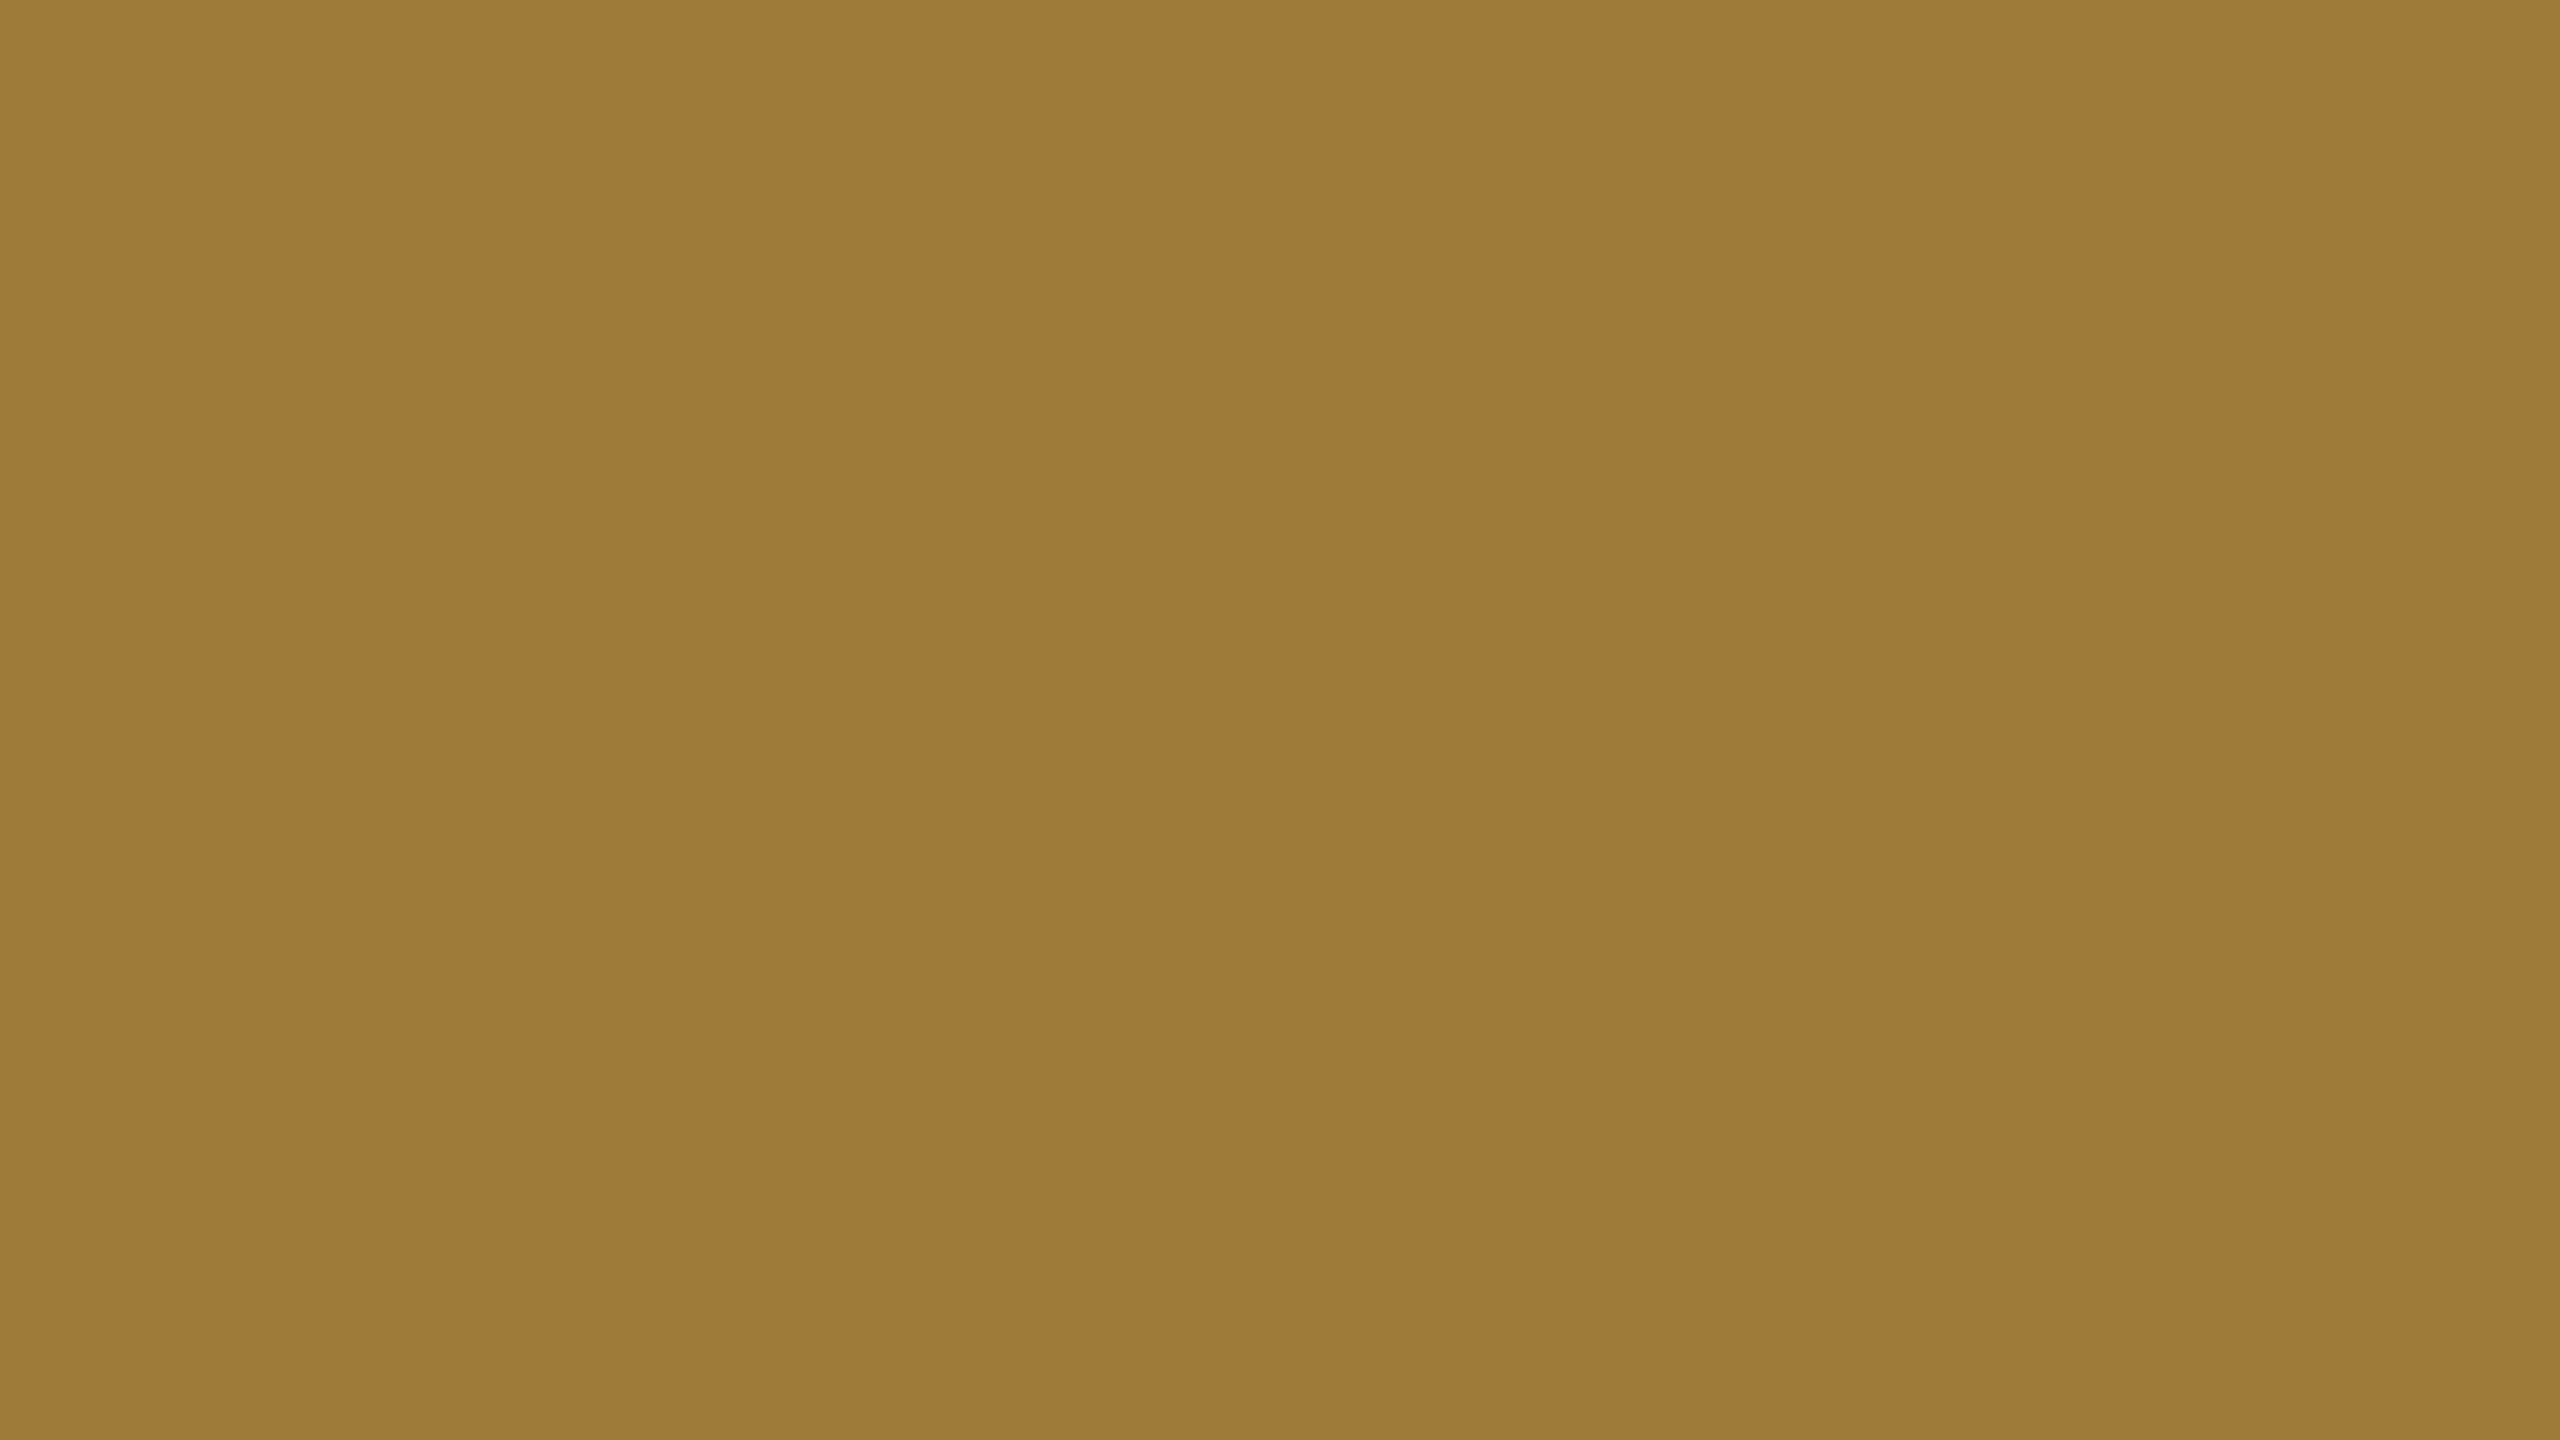 2560x1440 Metallic Sunburst Solid Color Background